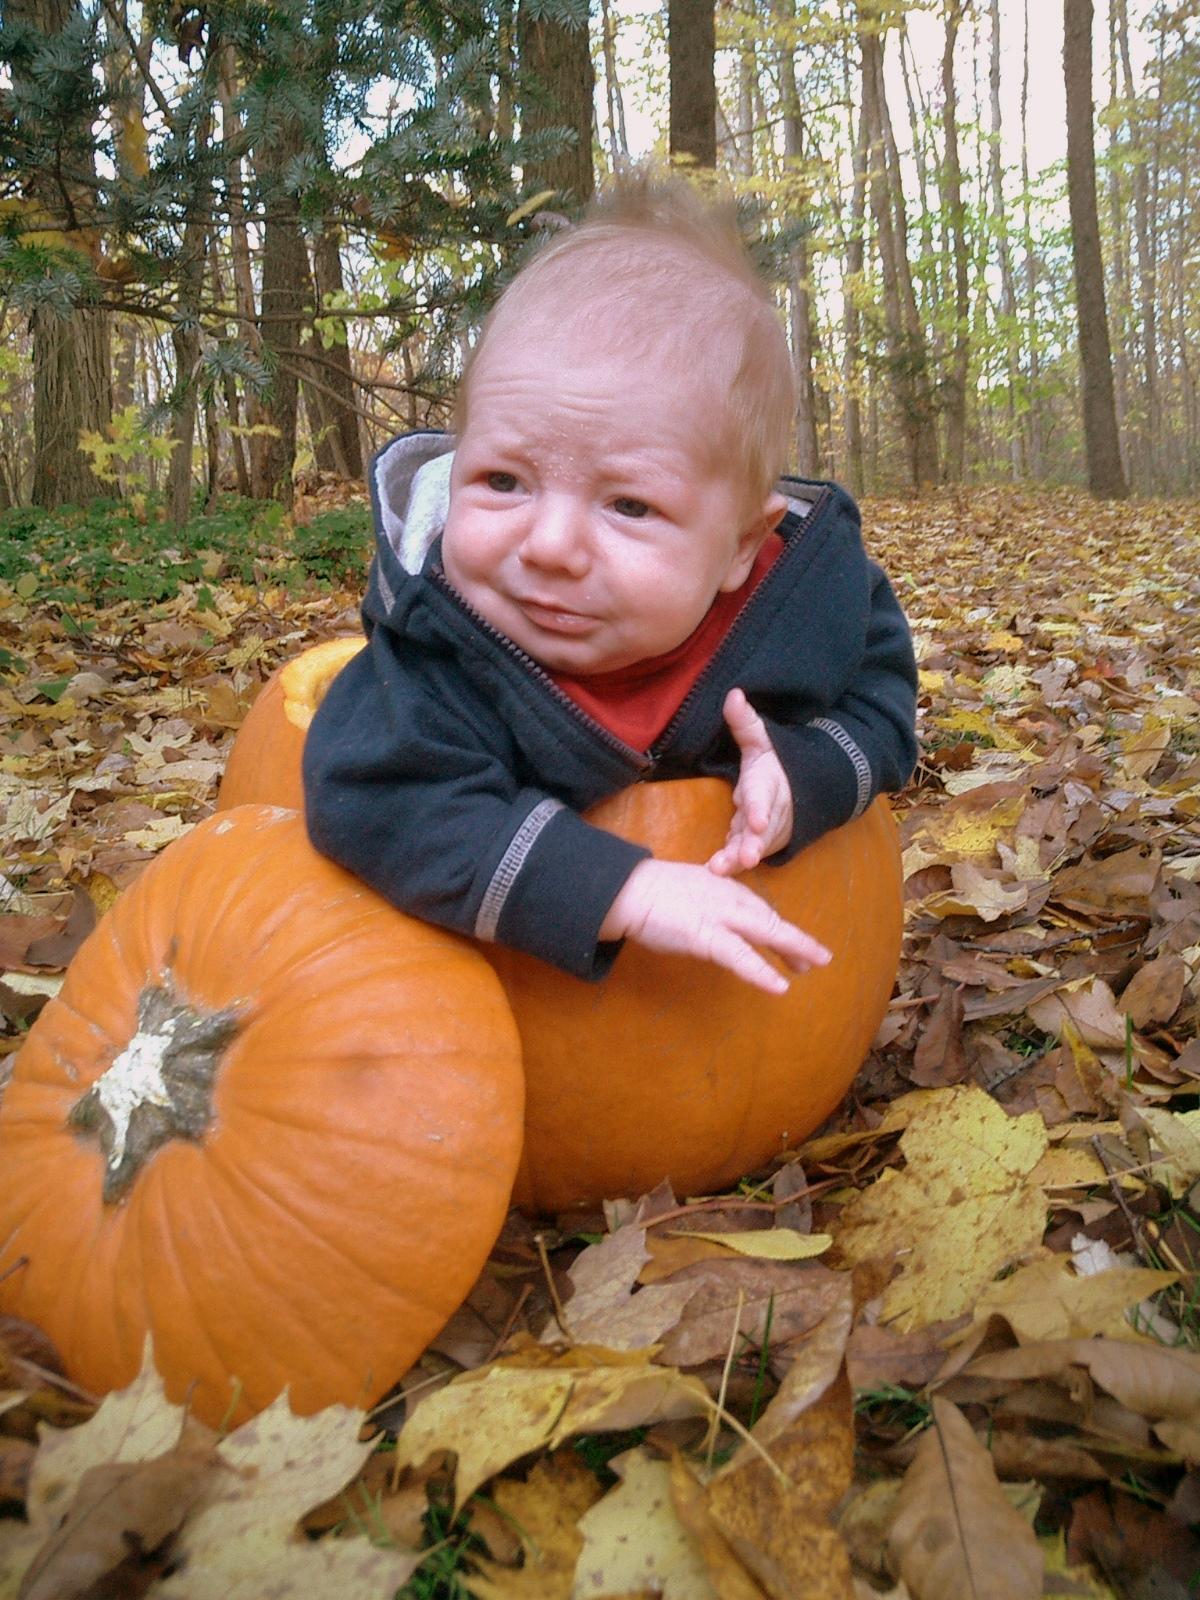 Fall Photo Shoot Ideas For Babies Pumpkins   fall photo ideaFall Photo Shoot Ideas For Babies